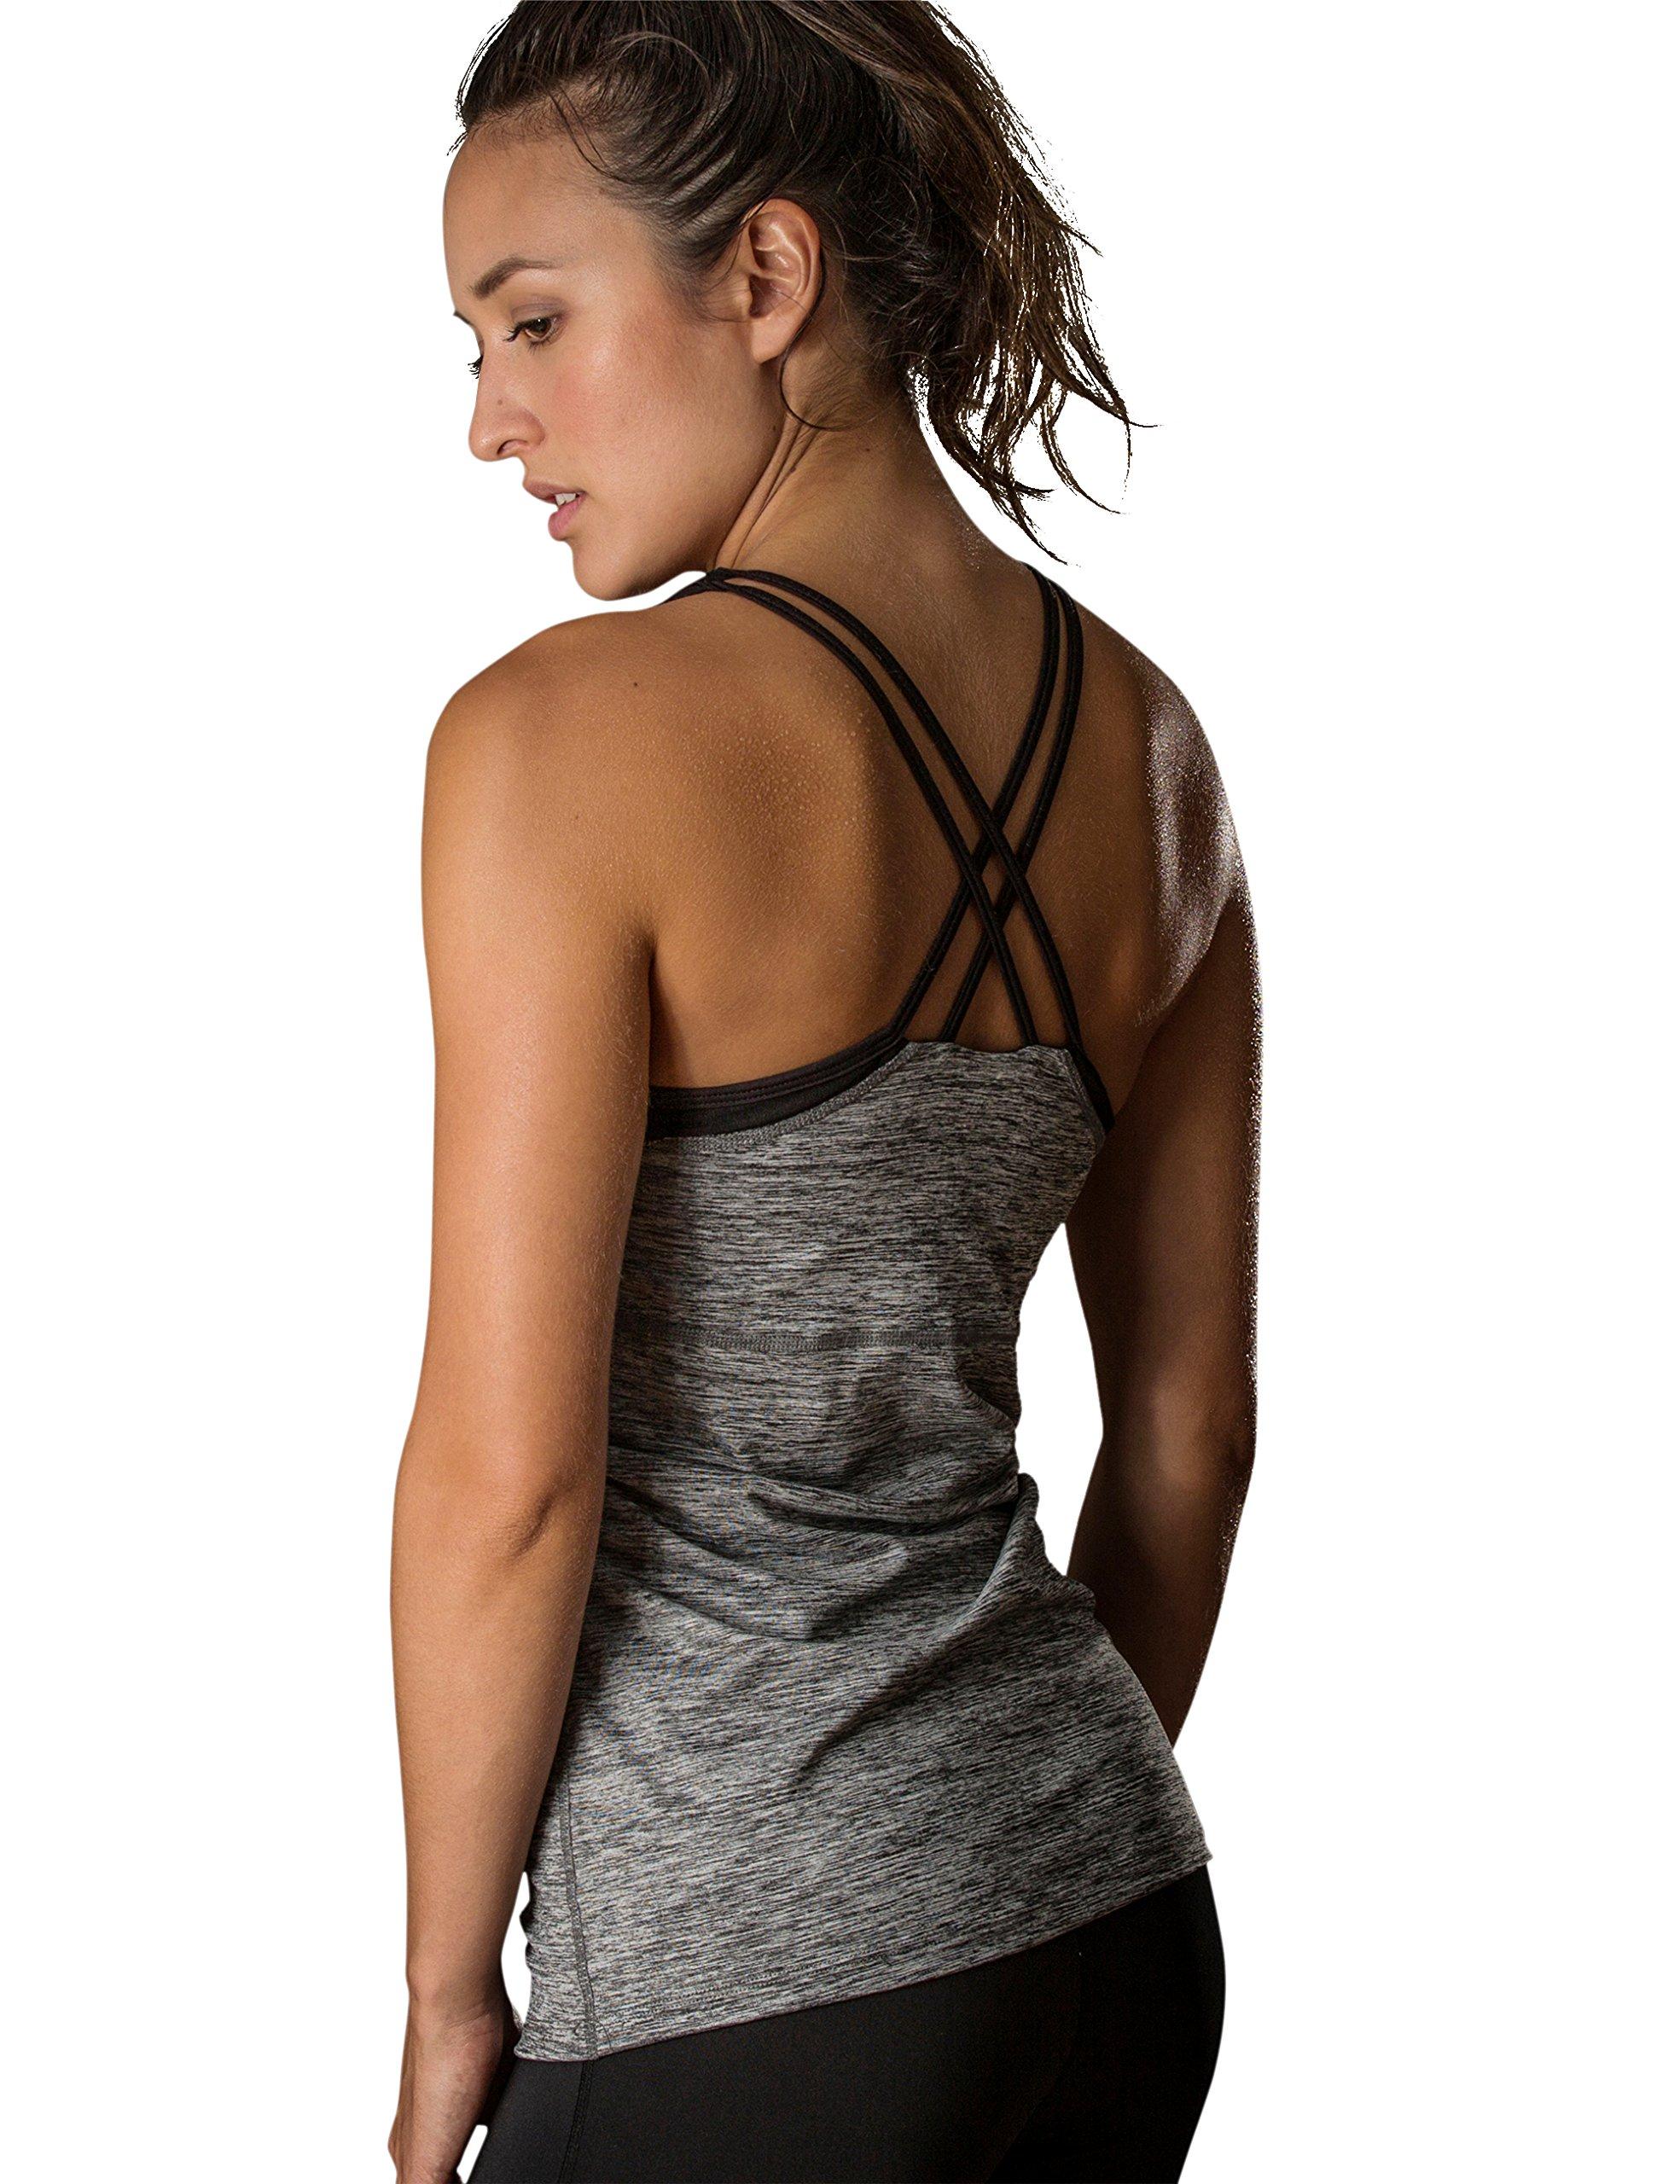 icyzone Women Workout Yoga Spaghetti Strap Racerback Tank Top with Built in Bra (L, Grey Melange)